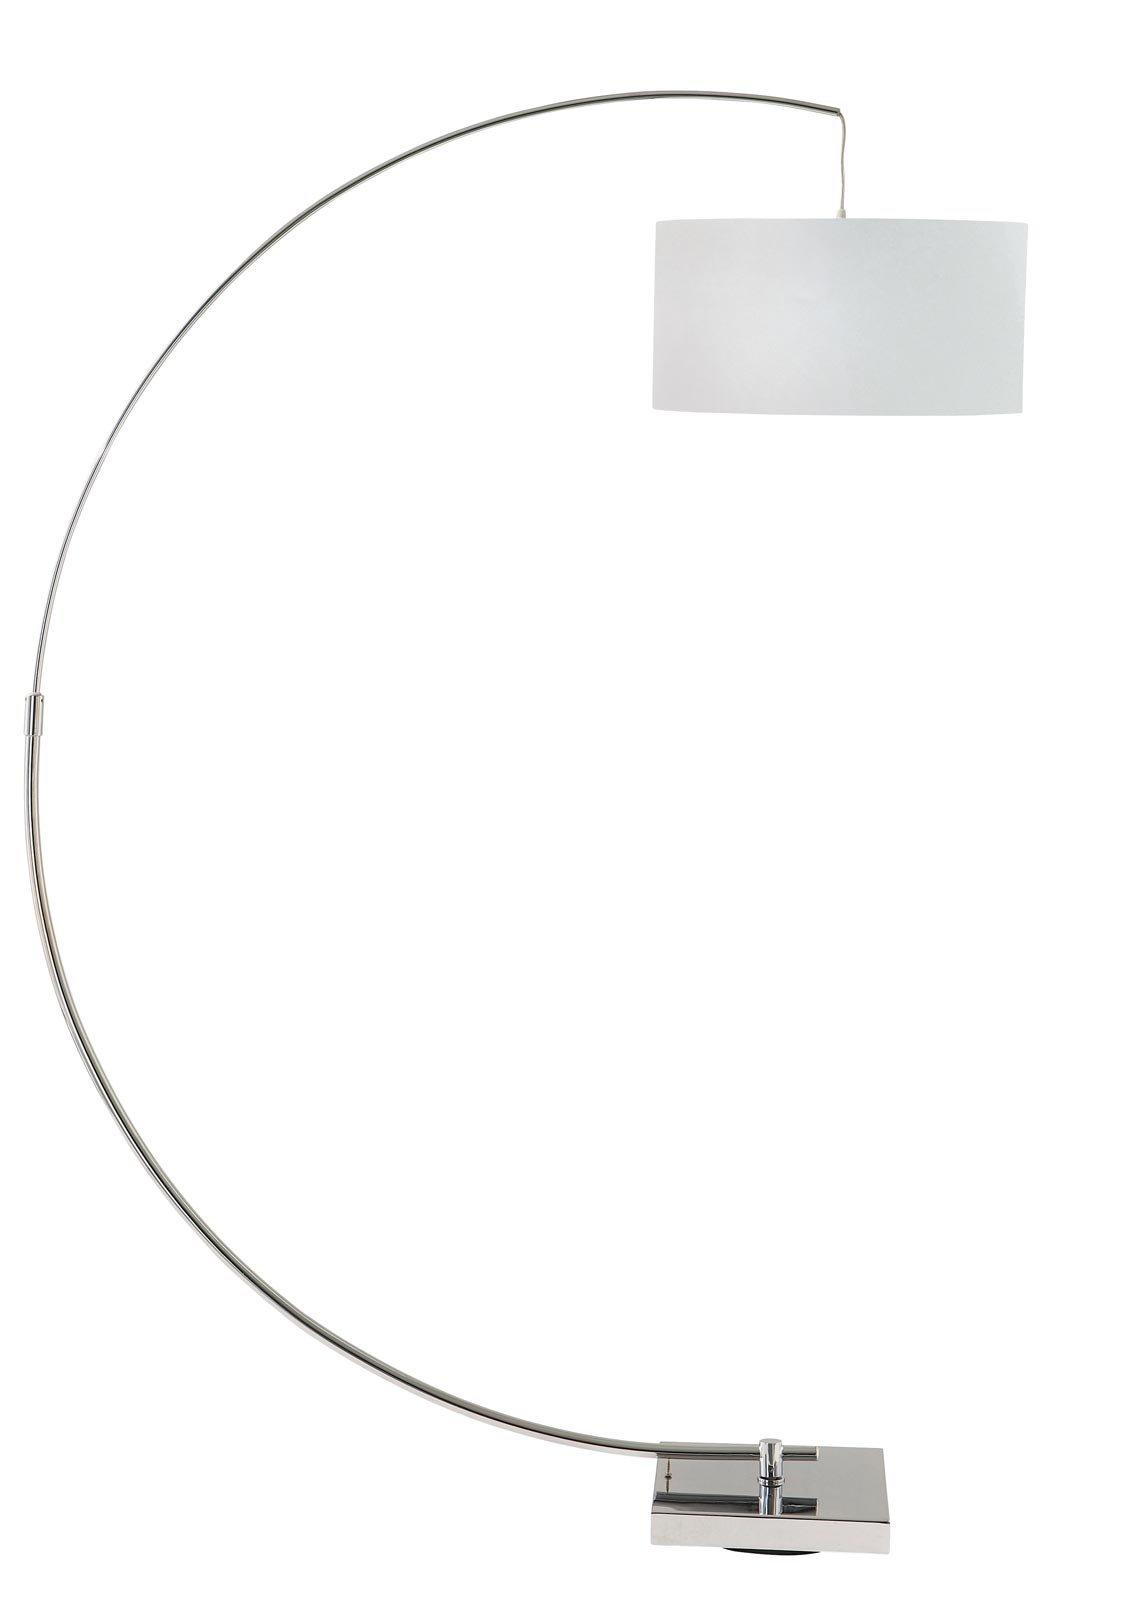 piantana ikea gallery of great lampadaire interieur ikea lampadaire halogne de salon lampes. Black Bedroom Furniture Sets. Home Design Ideas